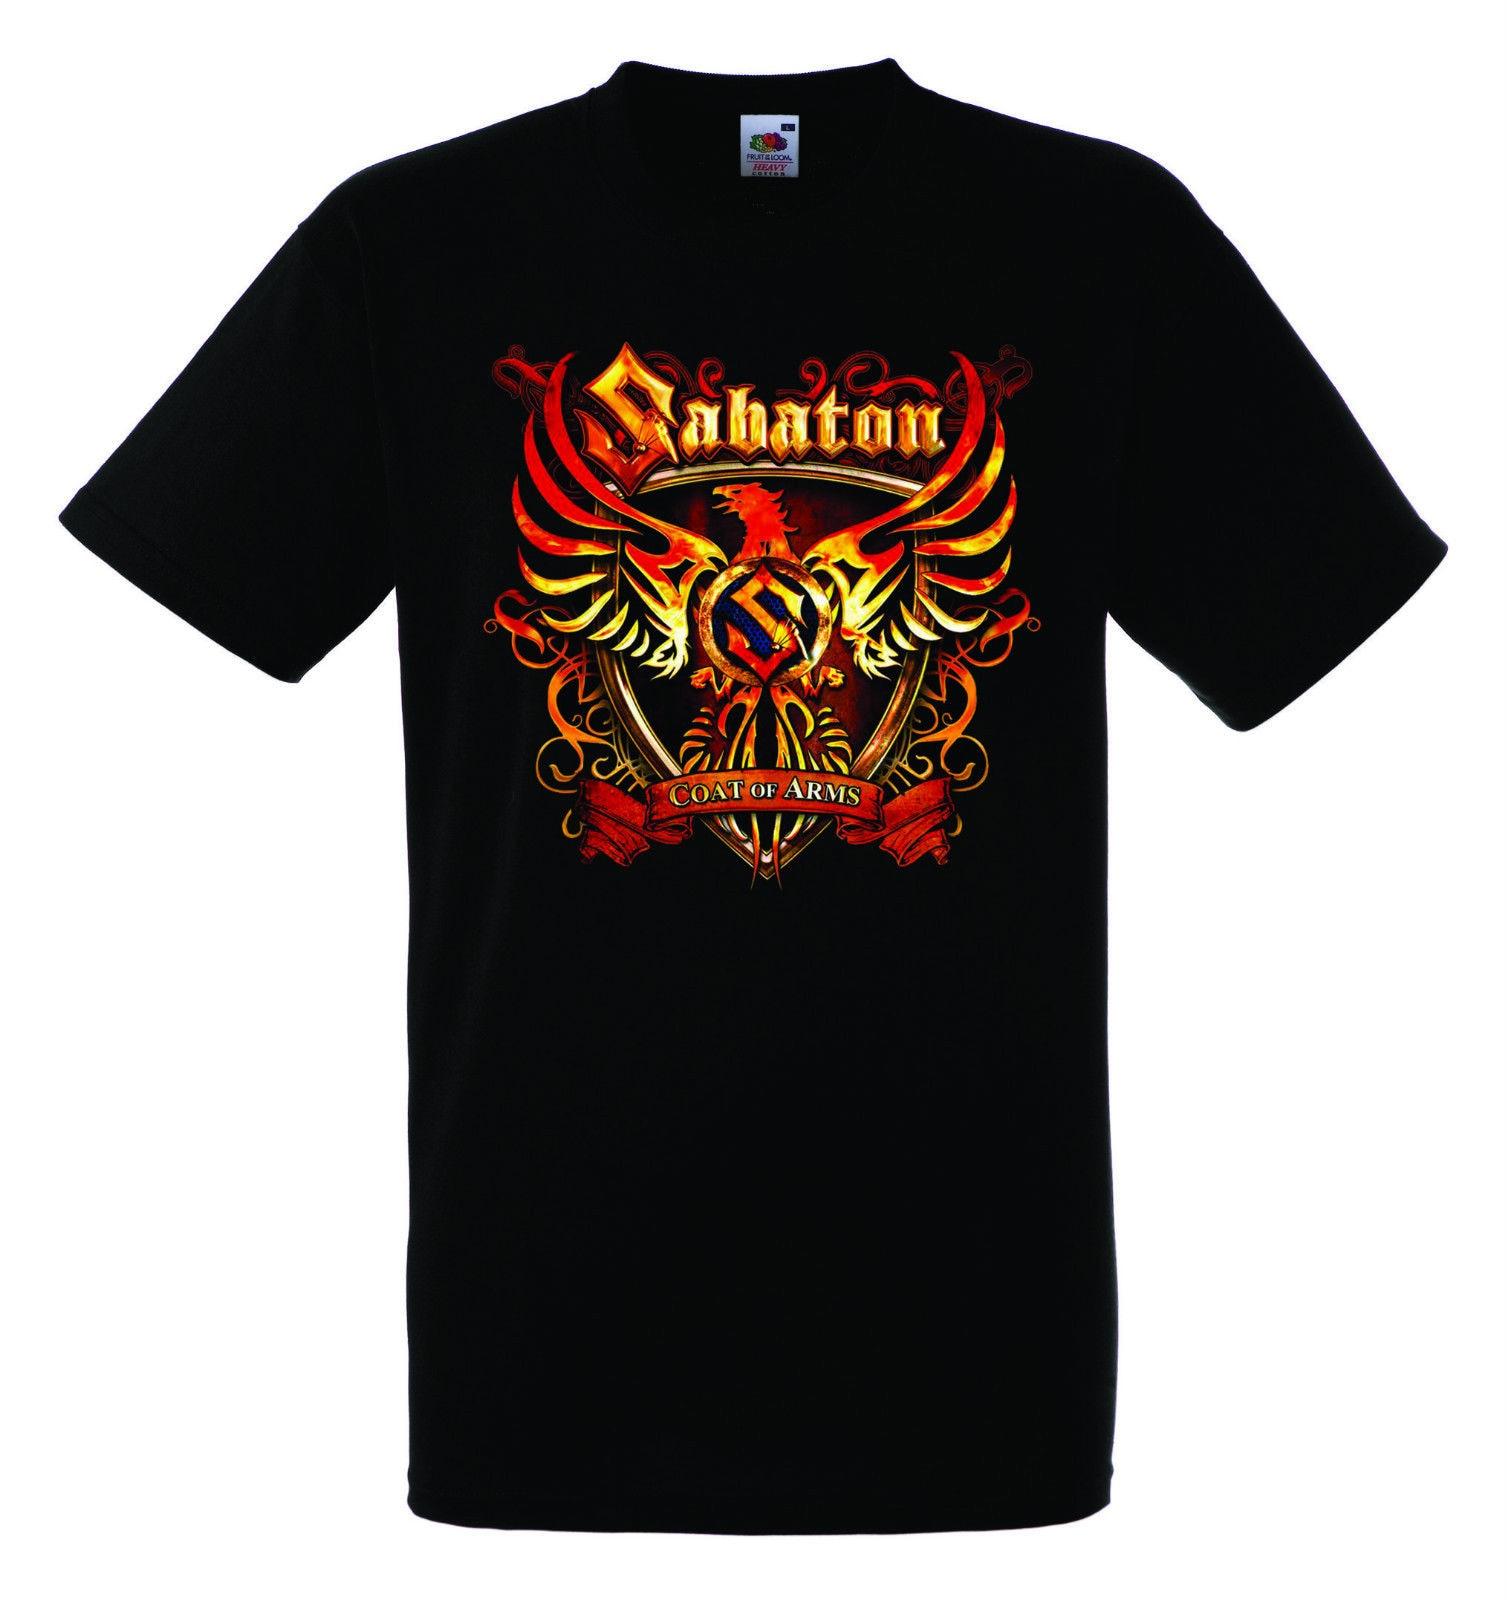 New SABATON Power Metal Band Logo Men/'s Black T-Shirt Size S-3XL Free Shipping